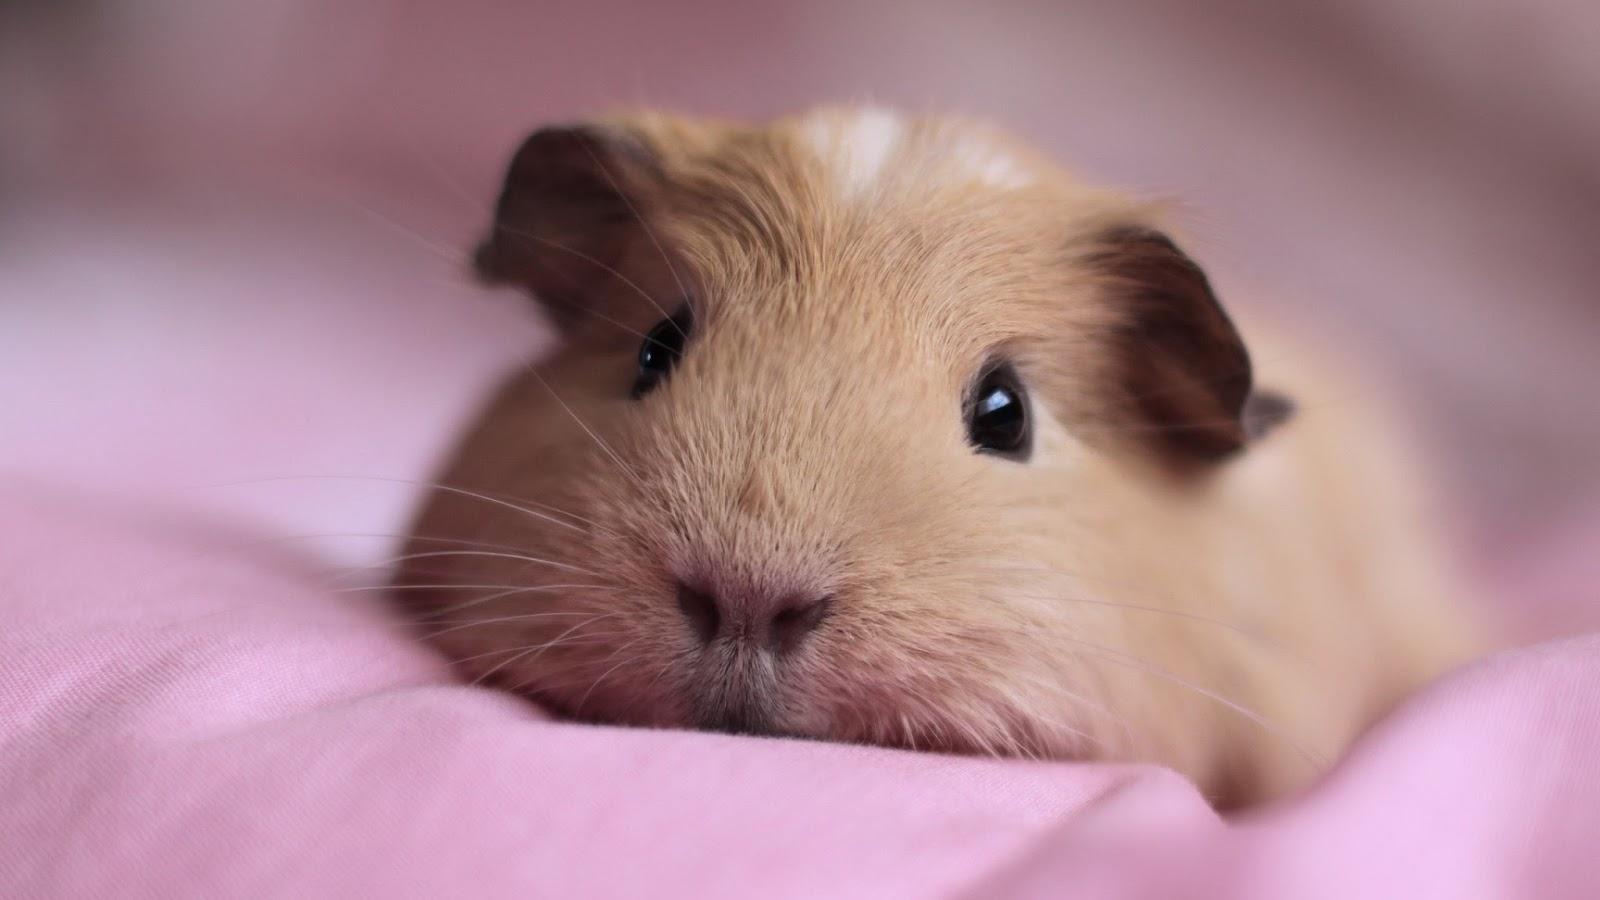 cute-guinea-pigs-in-costumes-wallpaper-3.jpg